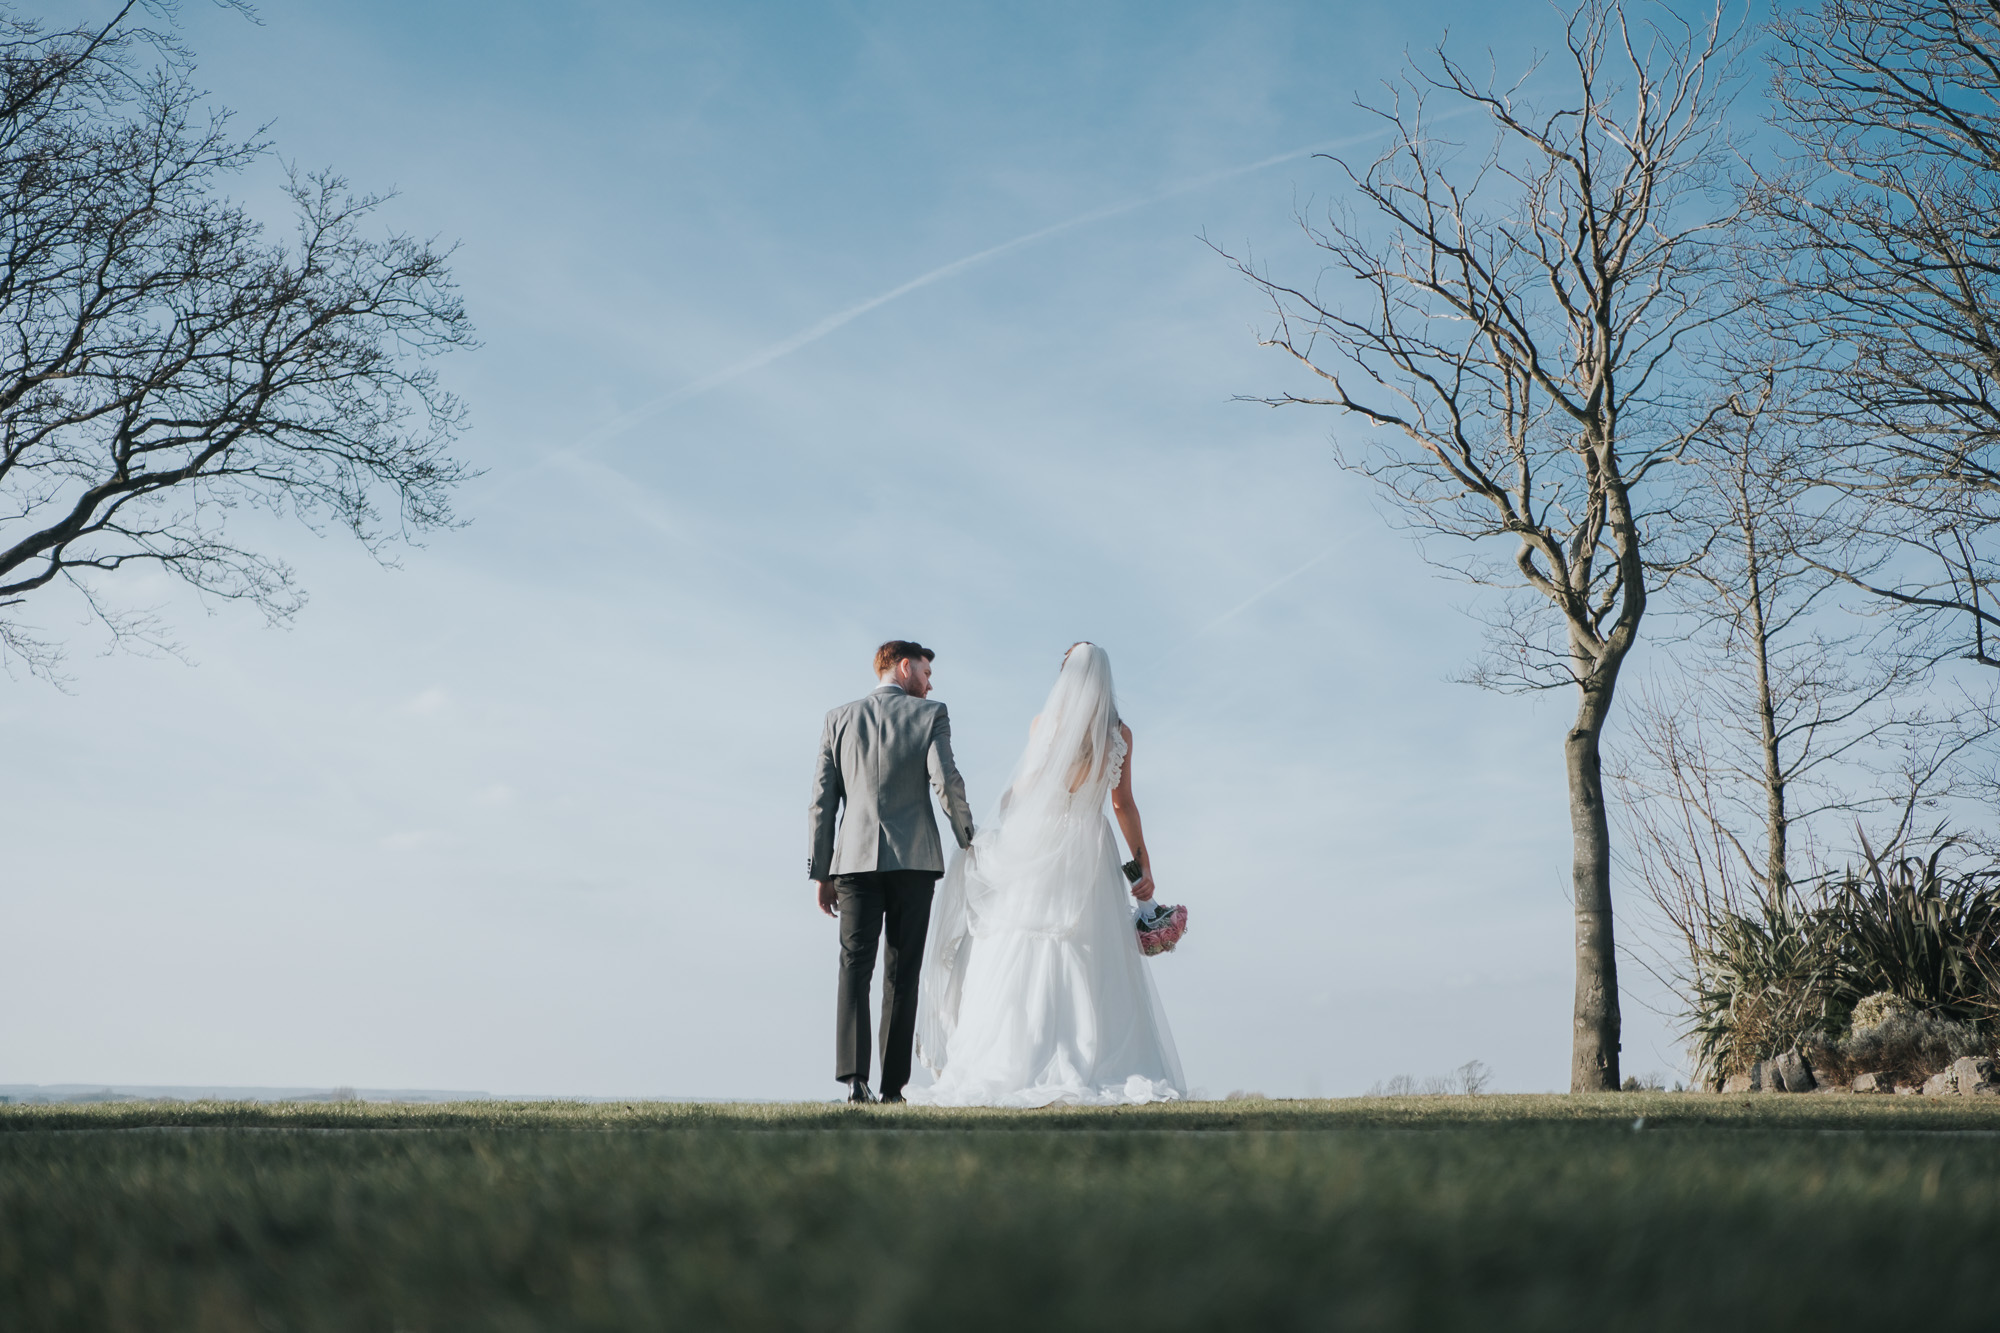 West Tower Exclusive Wedding Venue wedding photography merseyside and lancashire wedding photographer (37 of 60).jpg